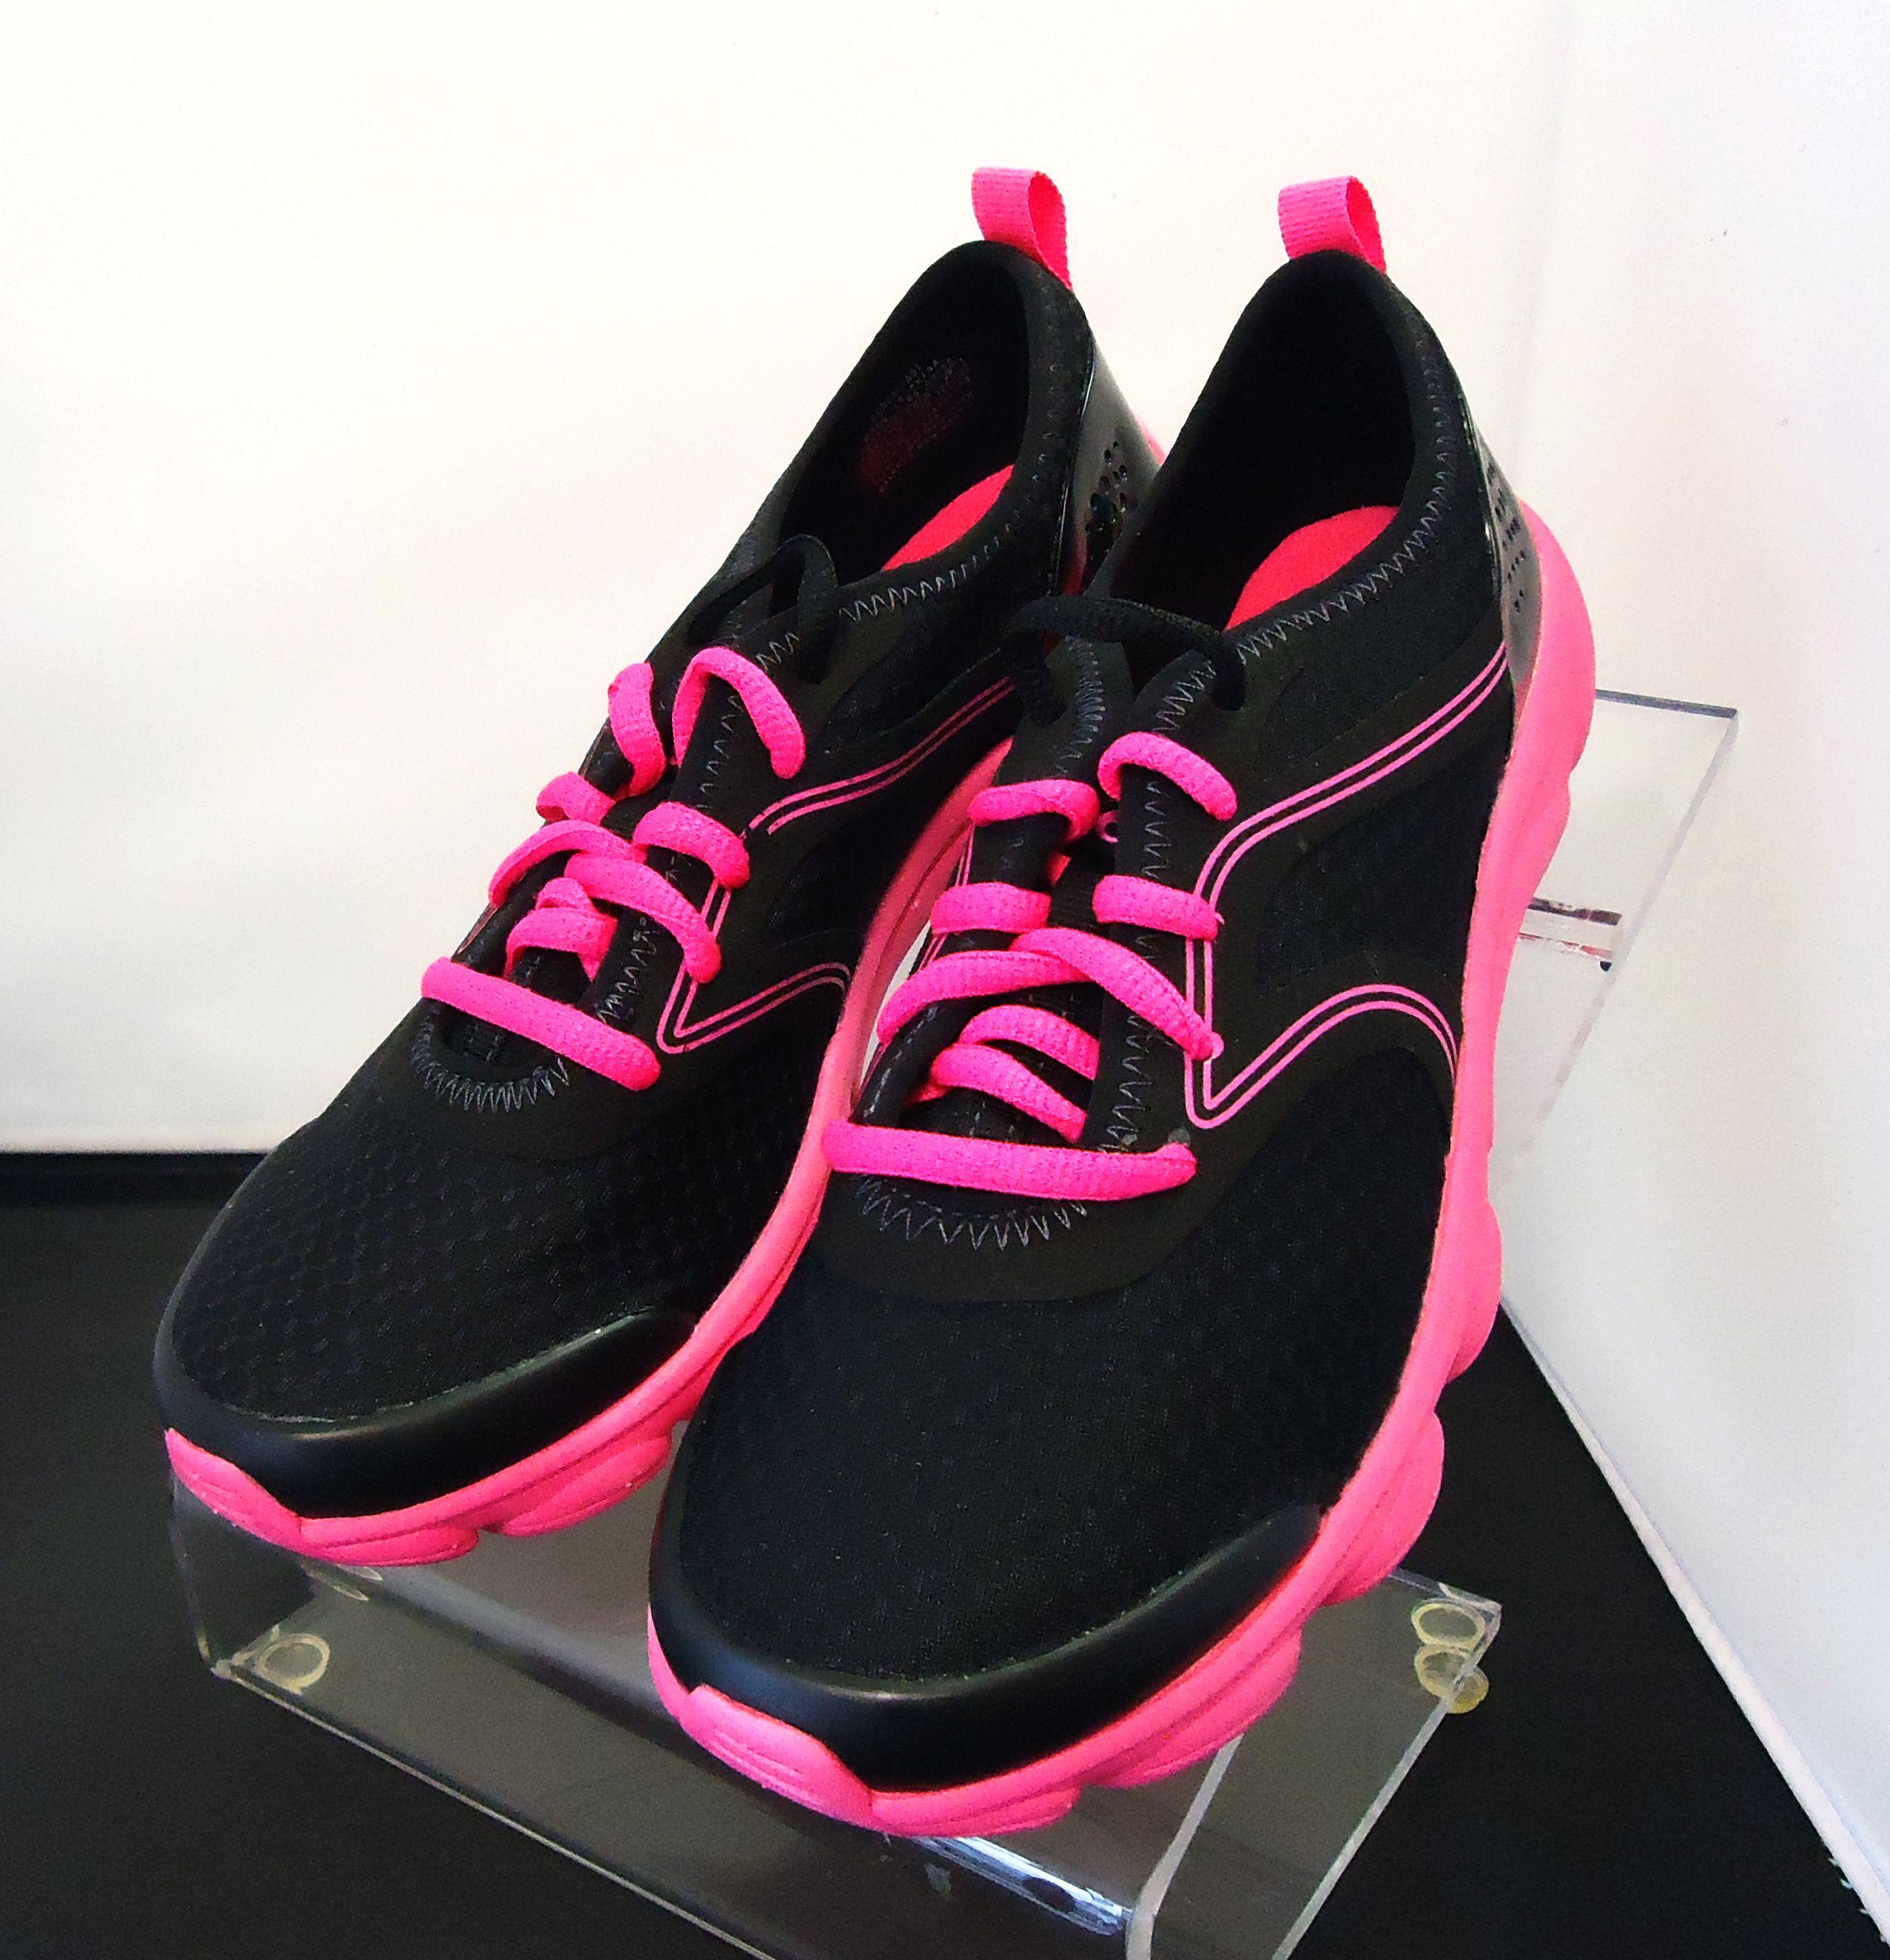 Where Can I Buy Easyspirit Tennis Shoes